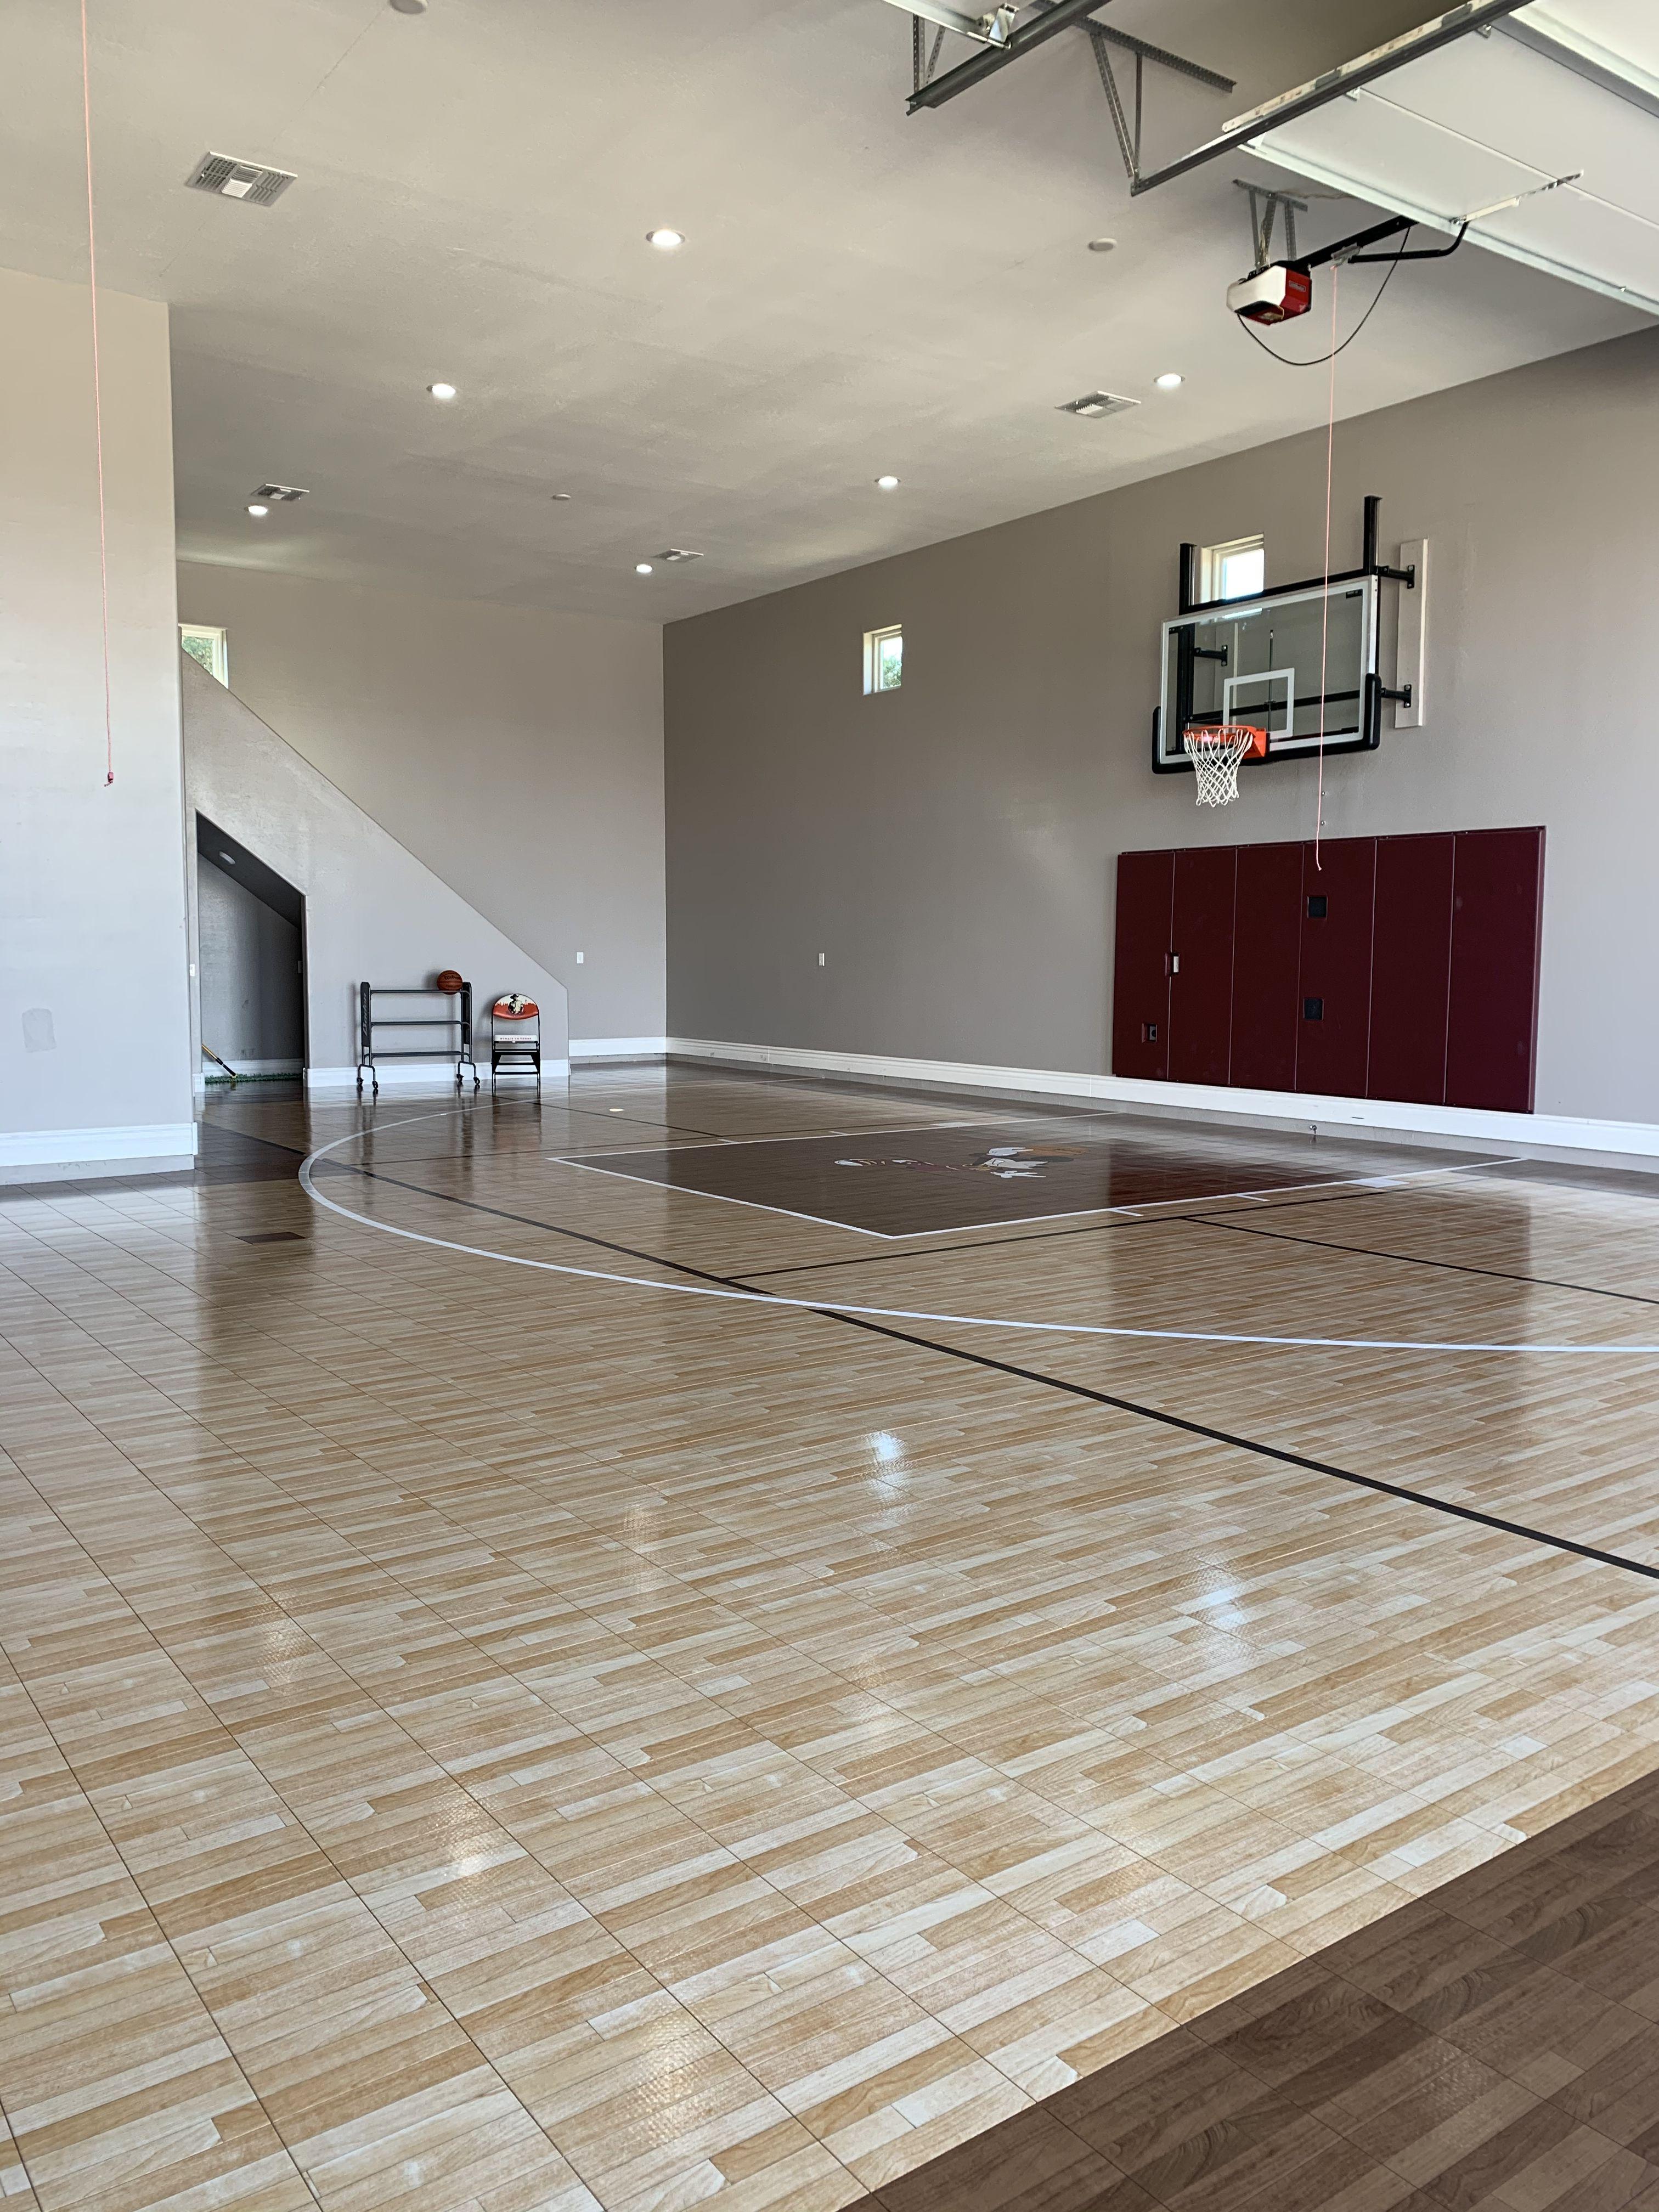 Indoor Basketball Court In Rv Garage Backyard Guest Houses Dream House Rv Garage